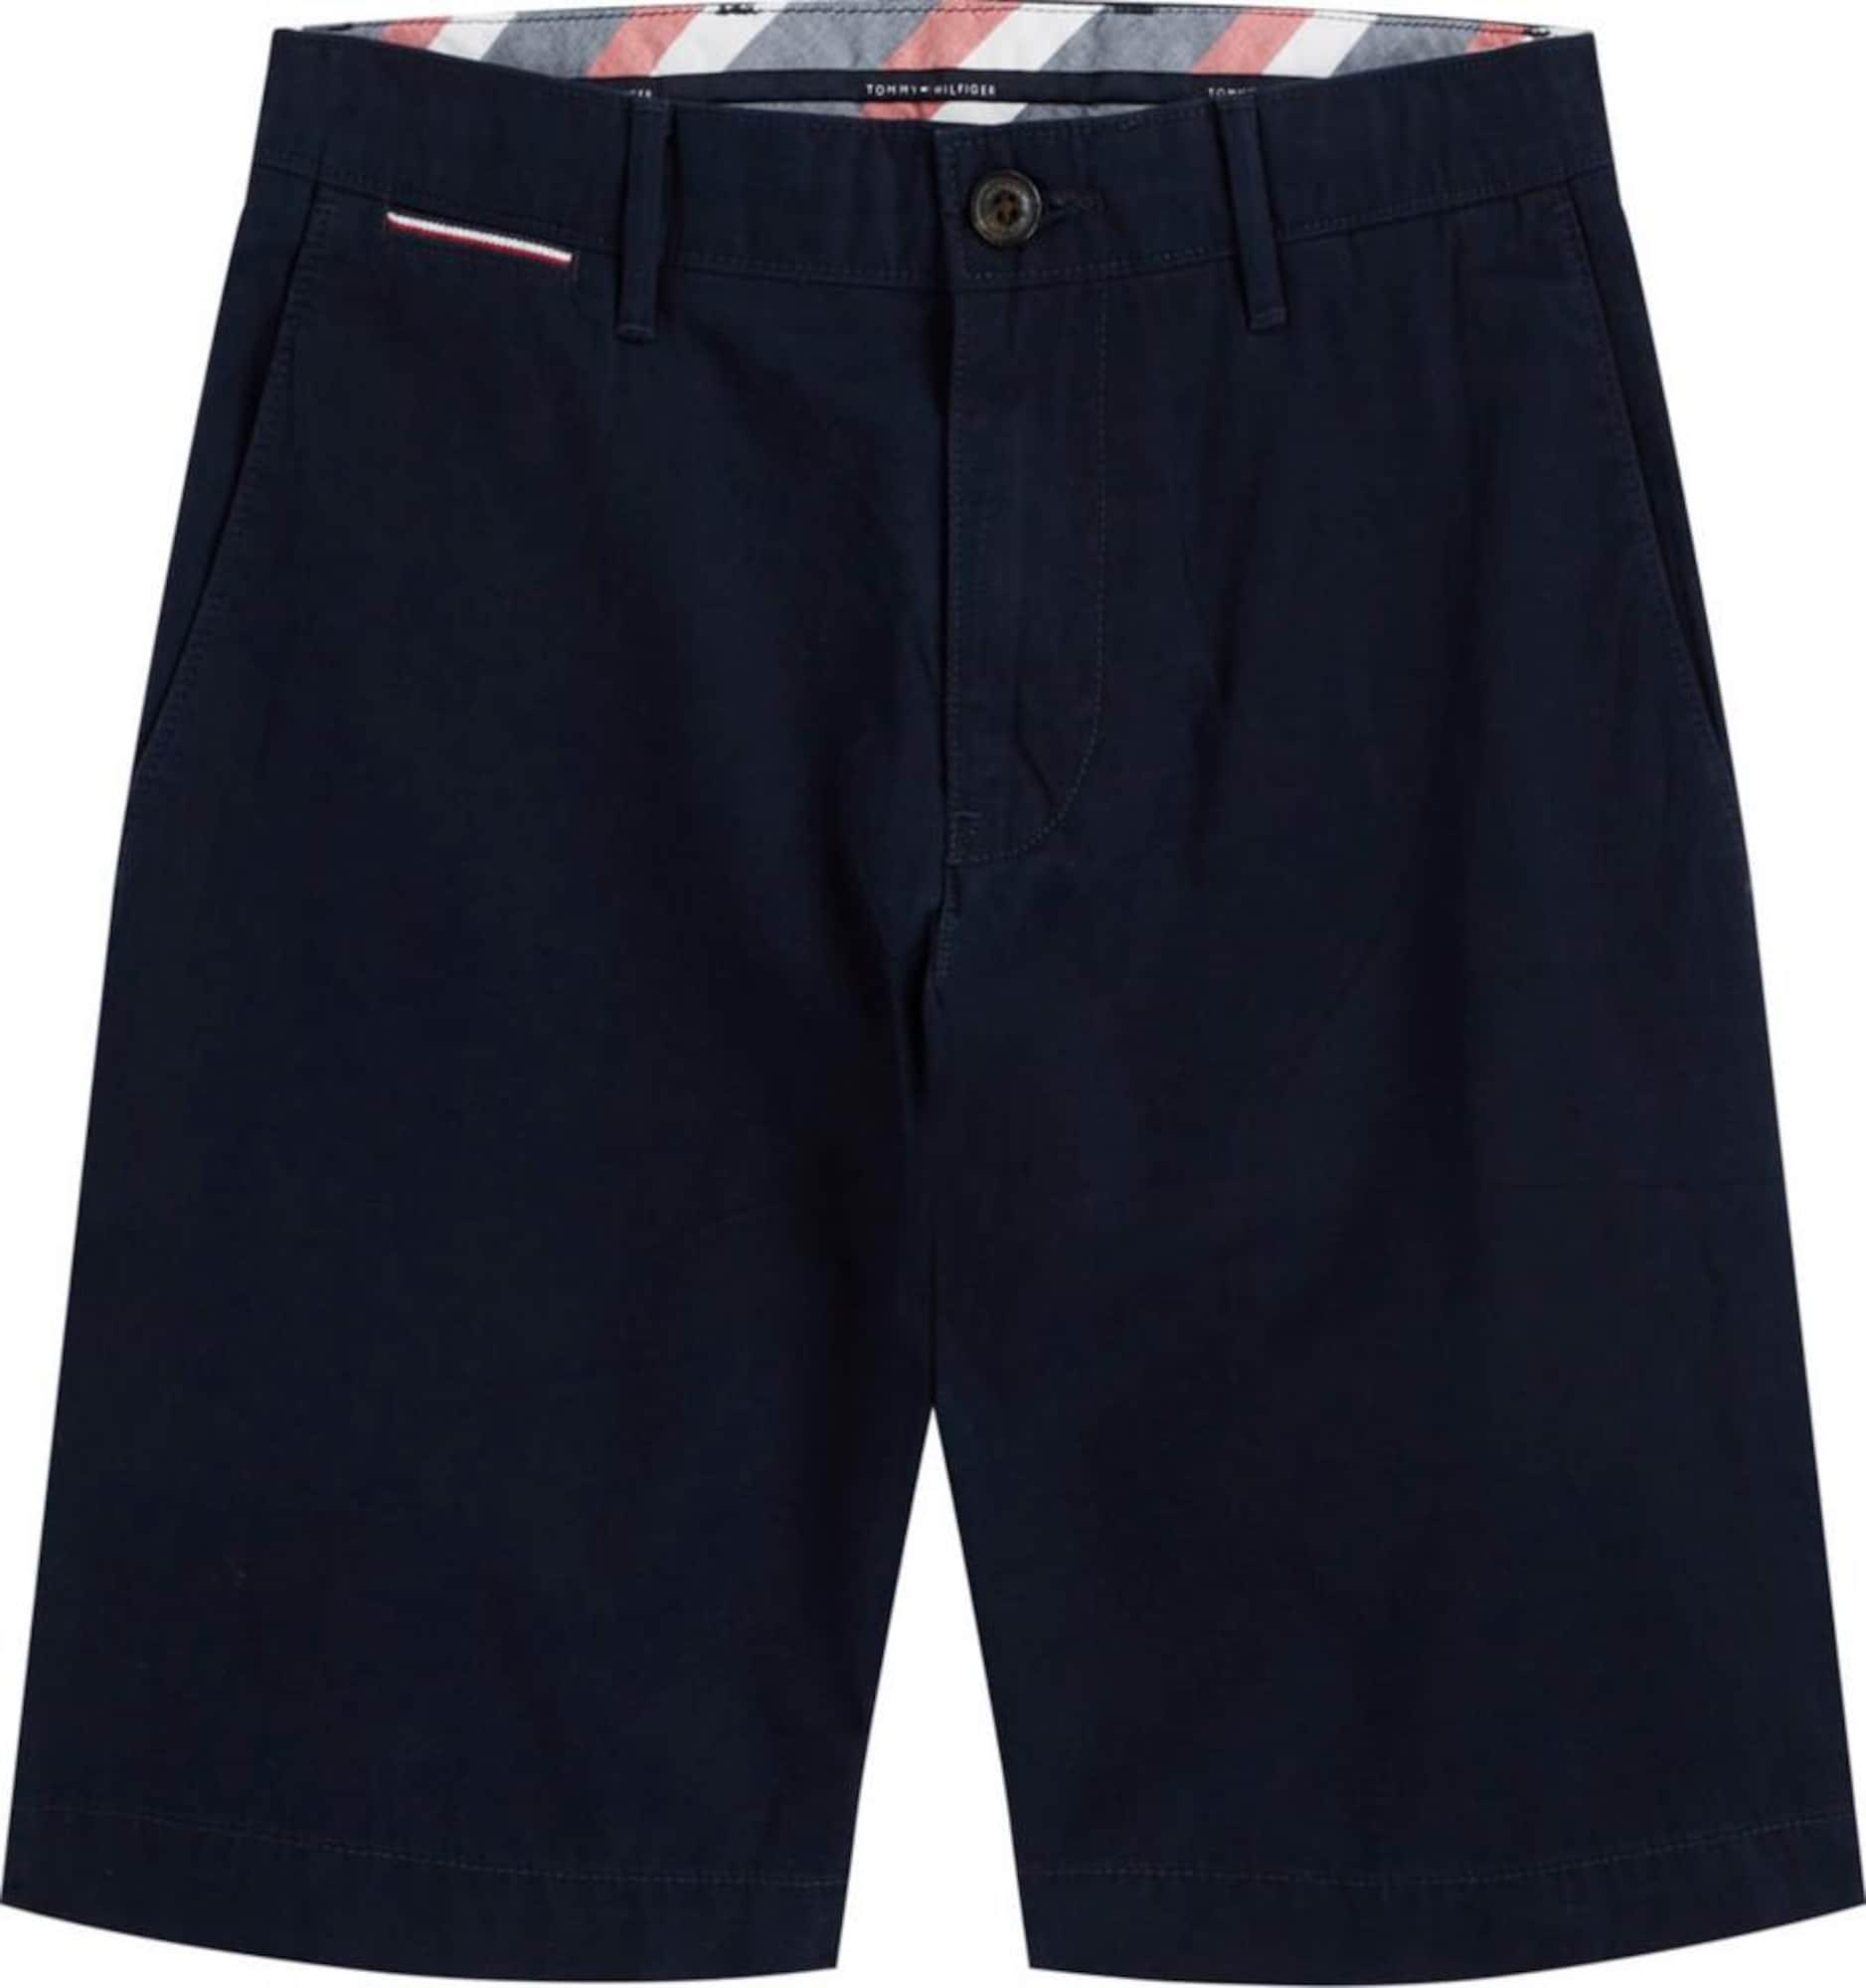 "TOMMY HILFIGER ""Chino"" stiliaus kelnės 'Brooklyn' tamsiai mėlyna / balta / ugnies raudona"